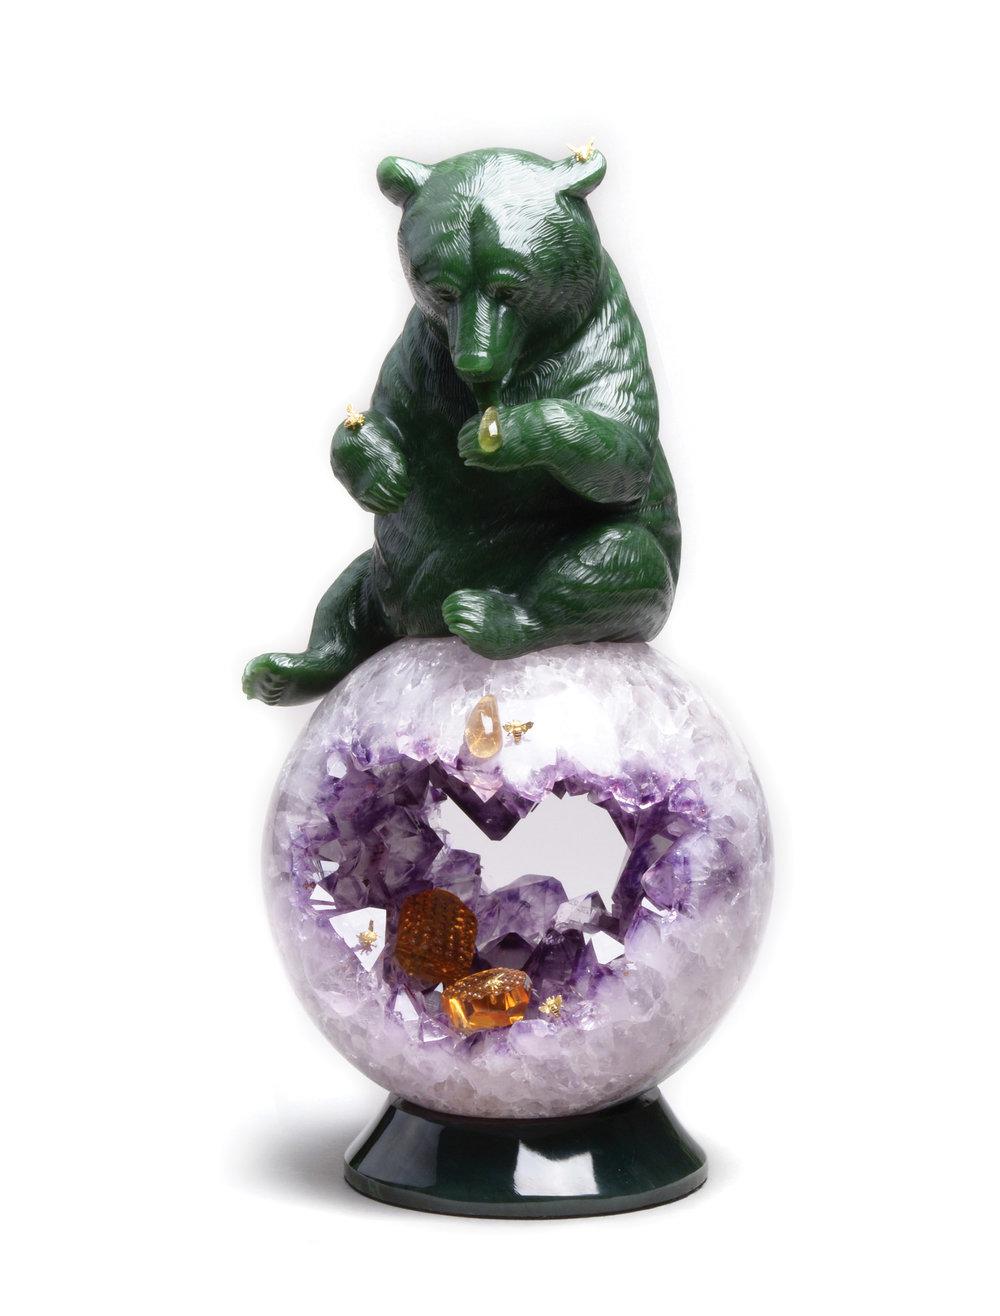 Lyle Sopel用碧玉雕塑出一隻正在舔舐蜂蜜的熊,球型的底座充分體現出了紫水晶、黃水晶的美麗色彩和晶瑩剔透。